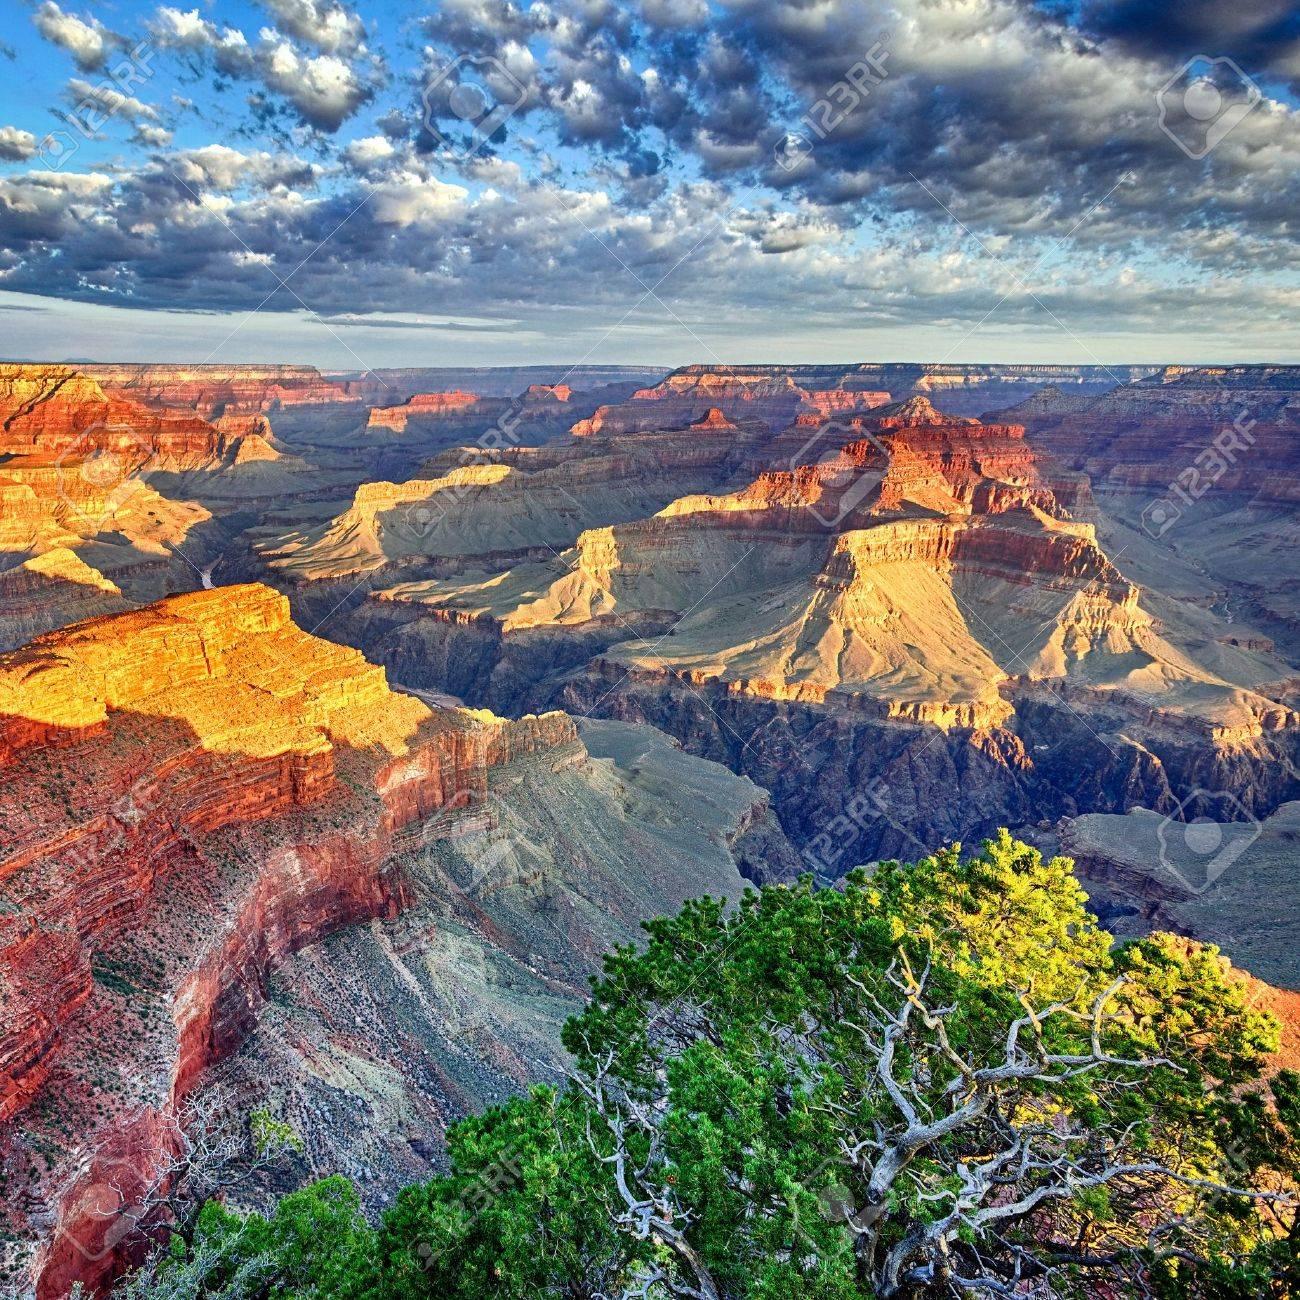 morning light at Grand Canyon, Arizona, USA - 17354206